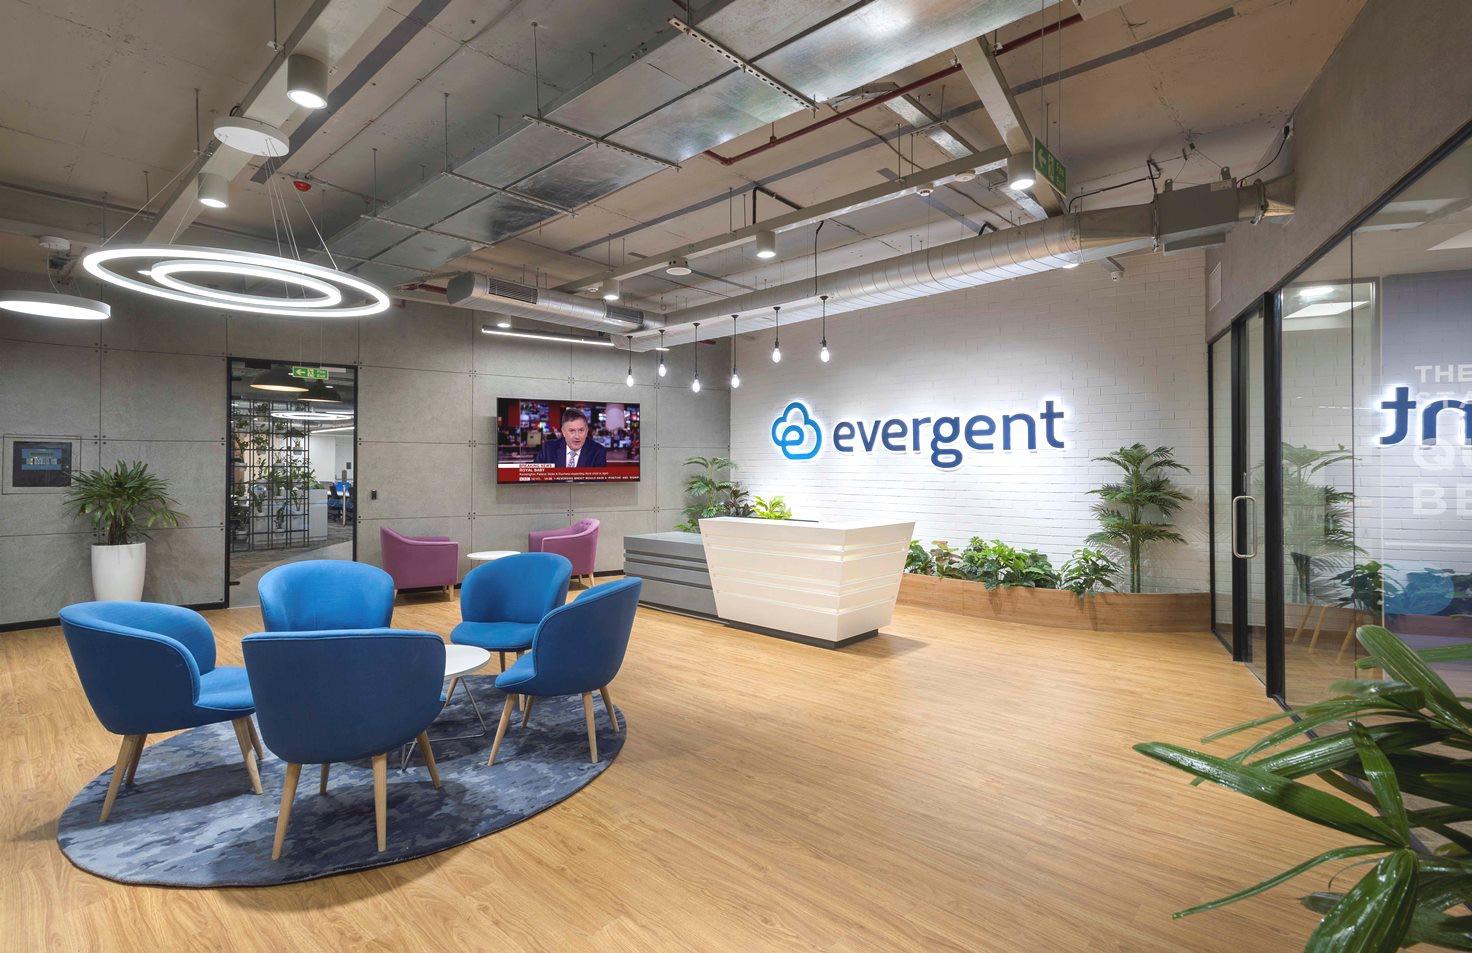 evergent-bangalore-office-11